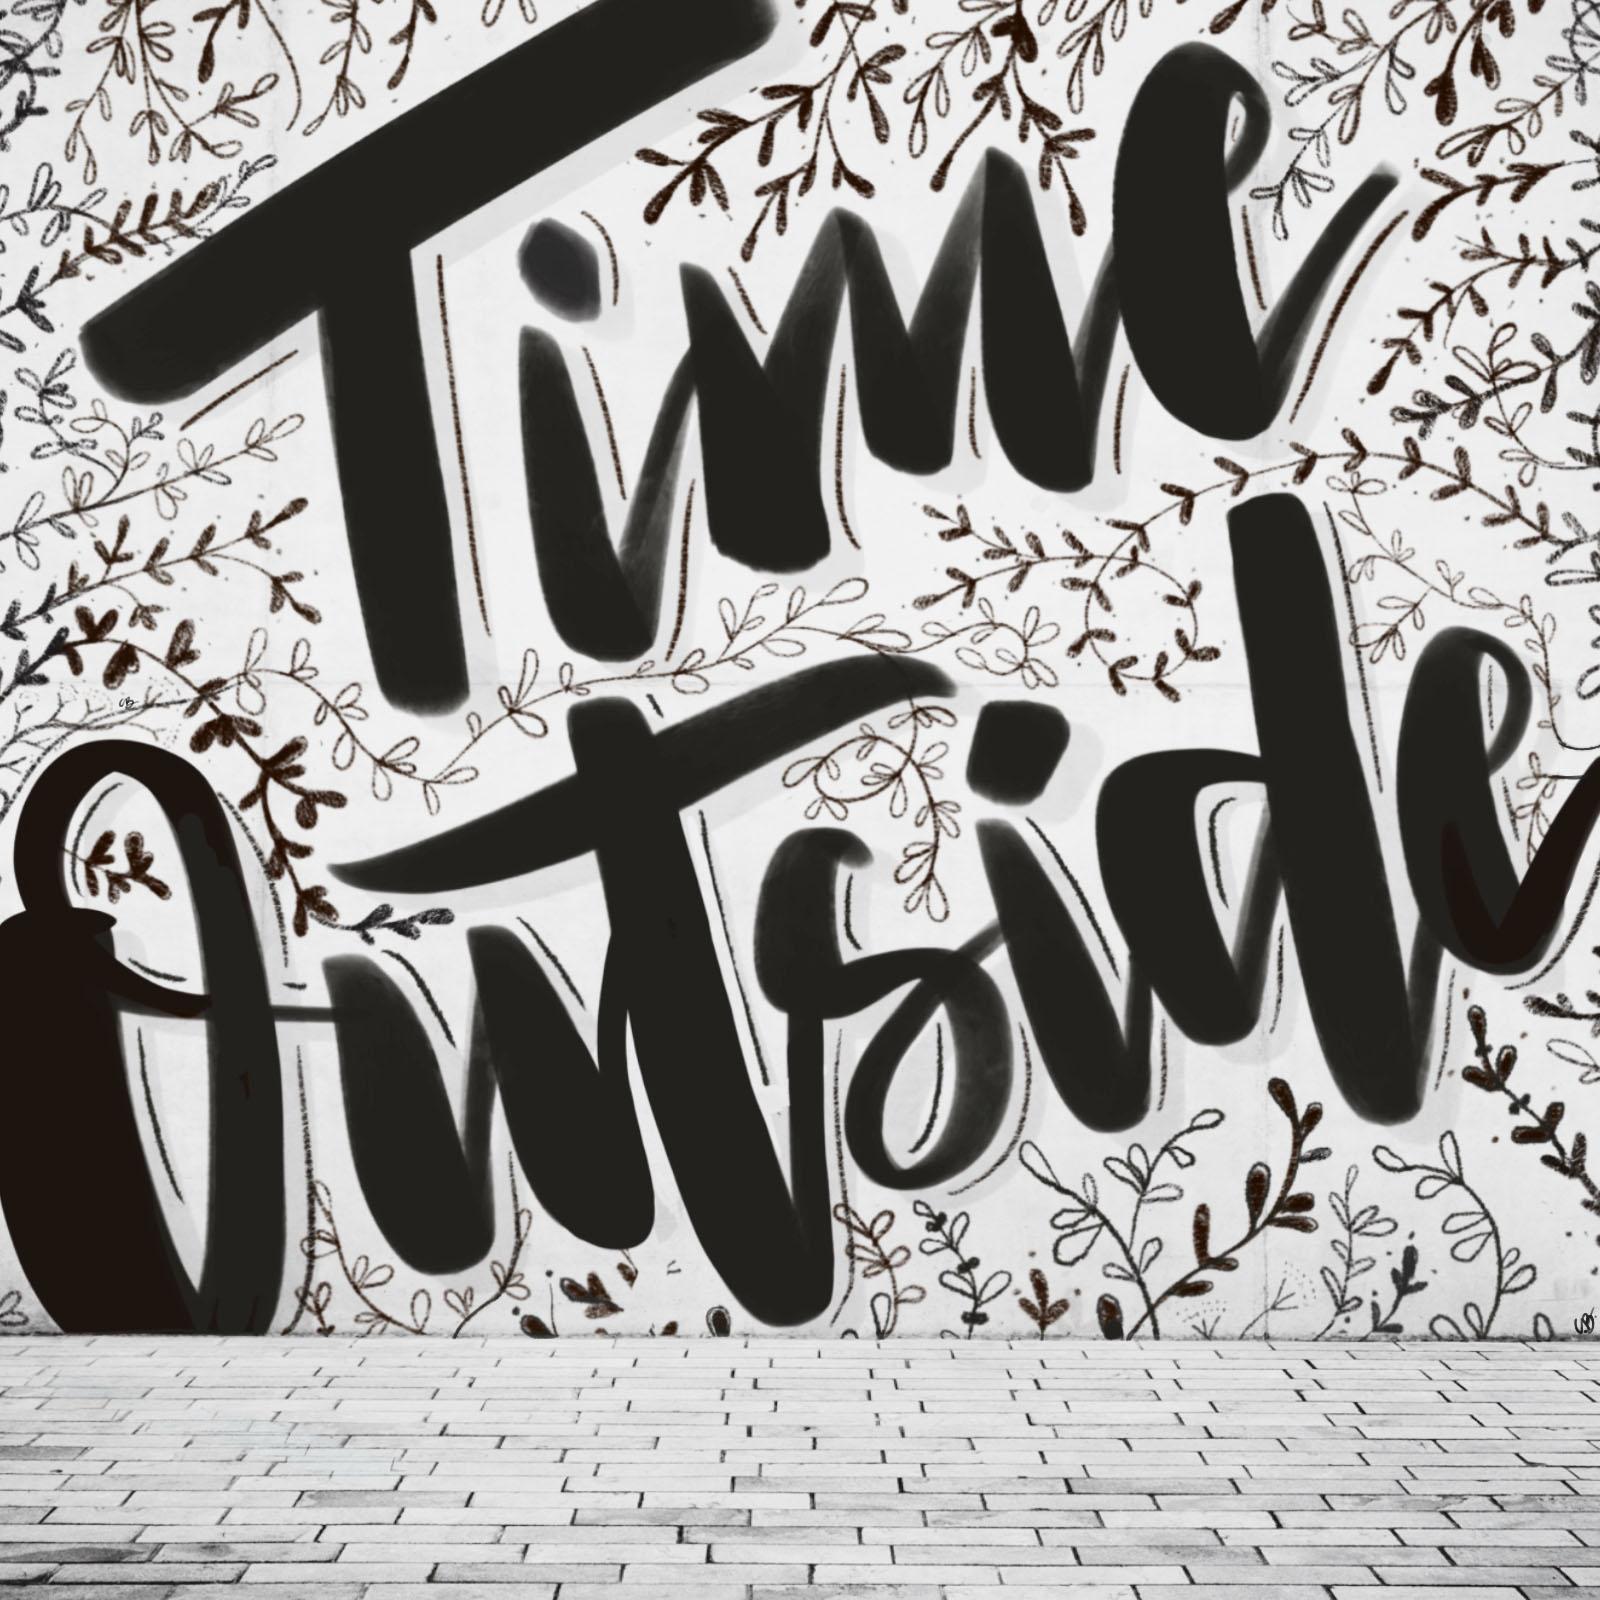 Time Outside - Clarice Bajkowski